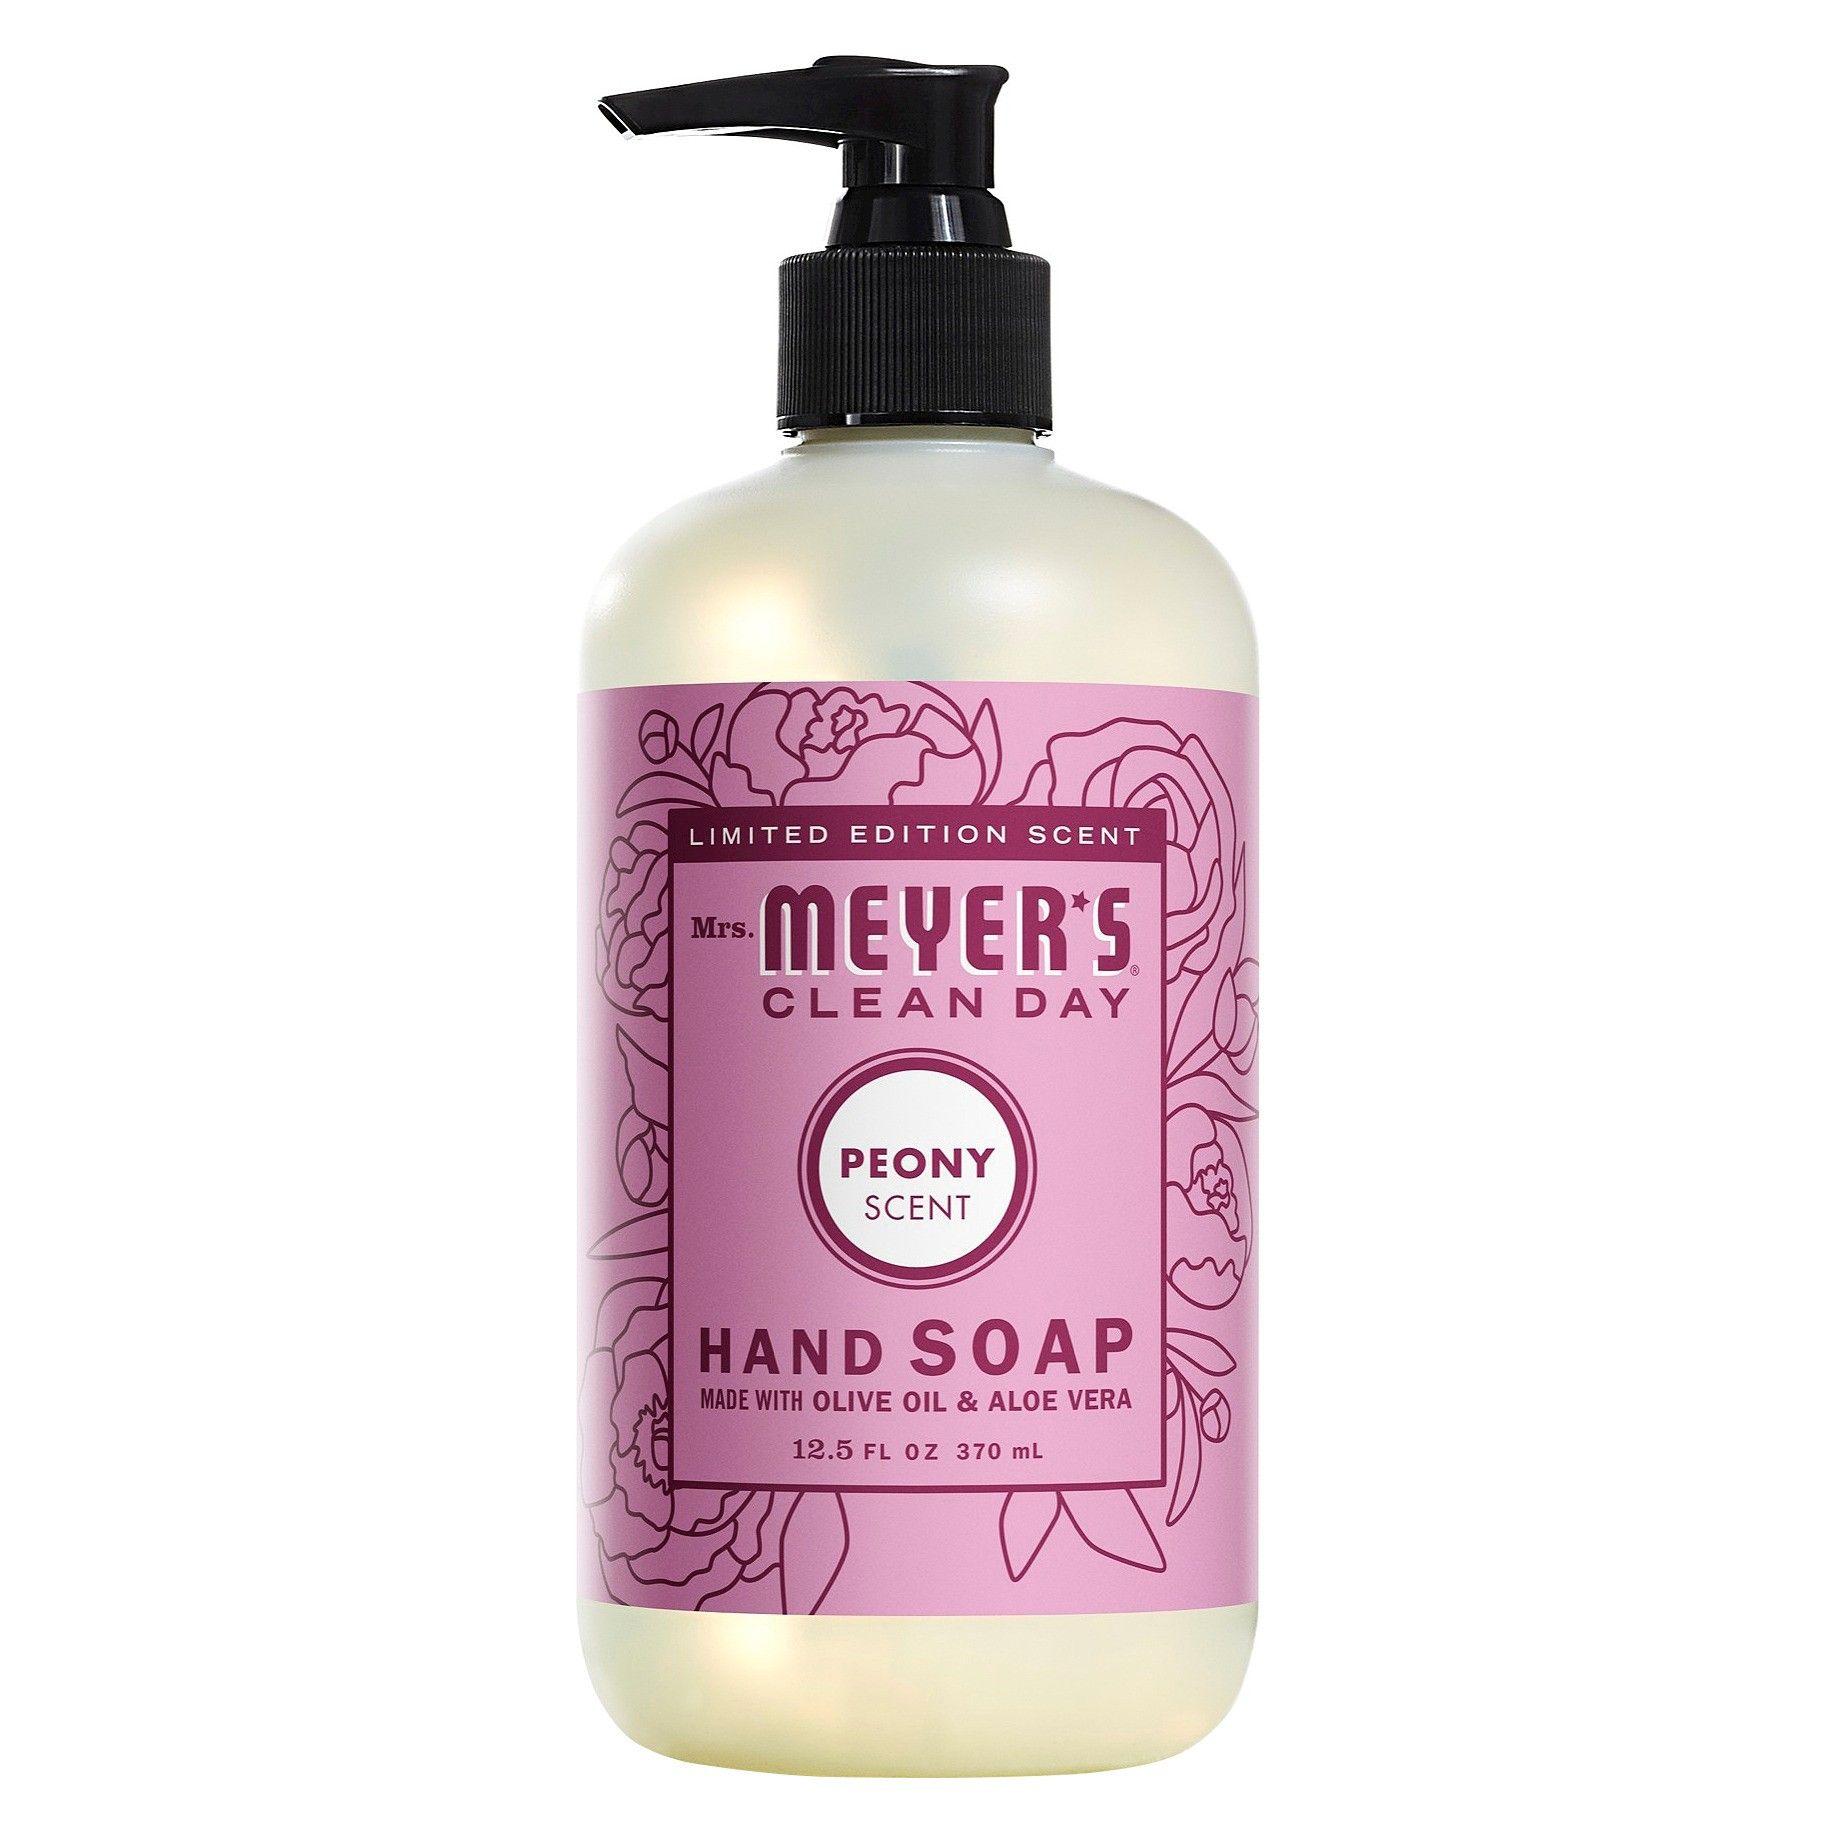 Mrs Meyer S Peony Scented Liquid Hand Soap 12 5 Fl Oz Liquid Hand Soap Peony Scent Lilac Scent